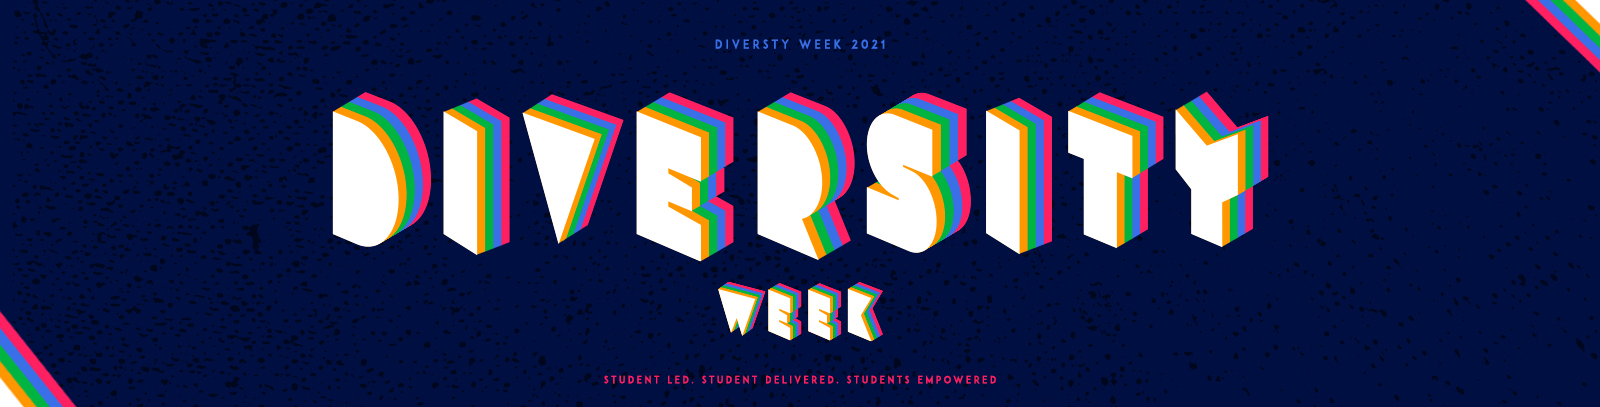 Diversityweekwebsitebanner